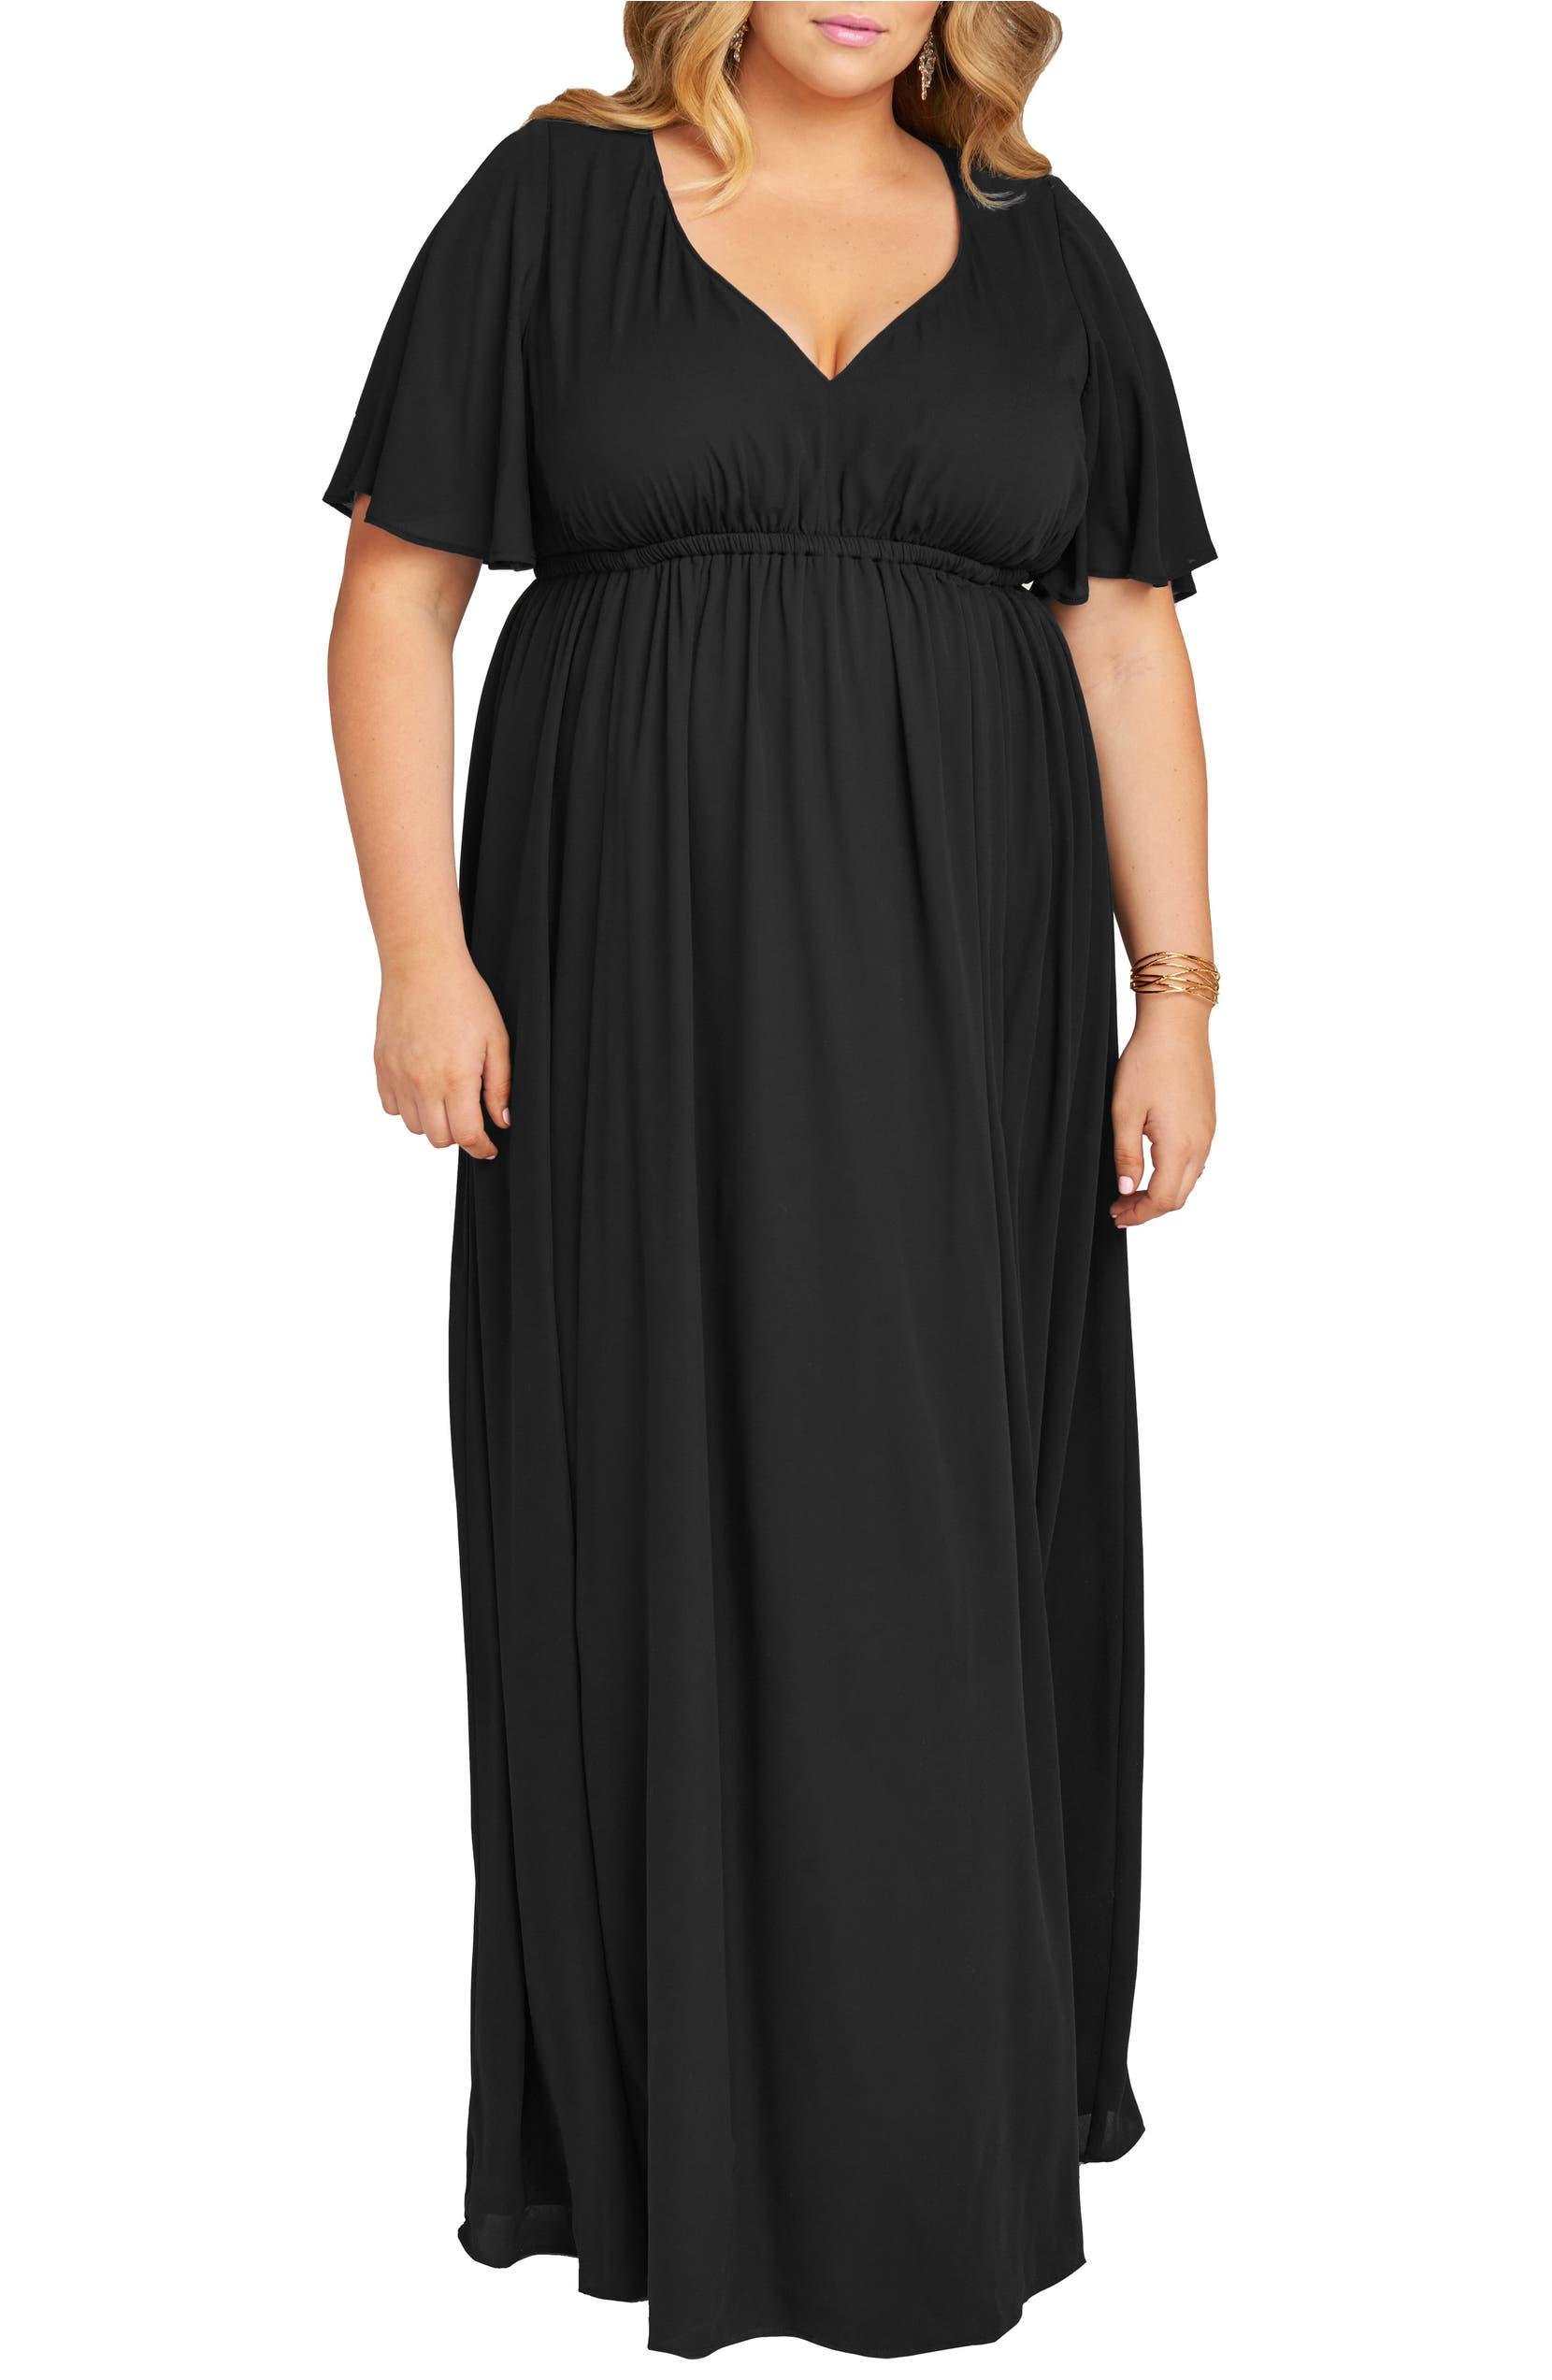 Emily Evening Dress